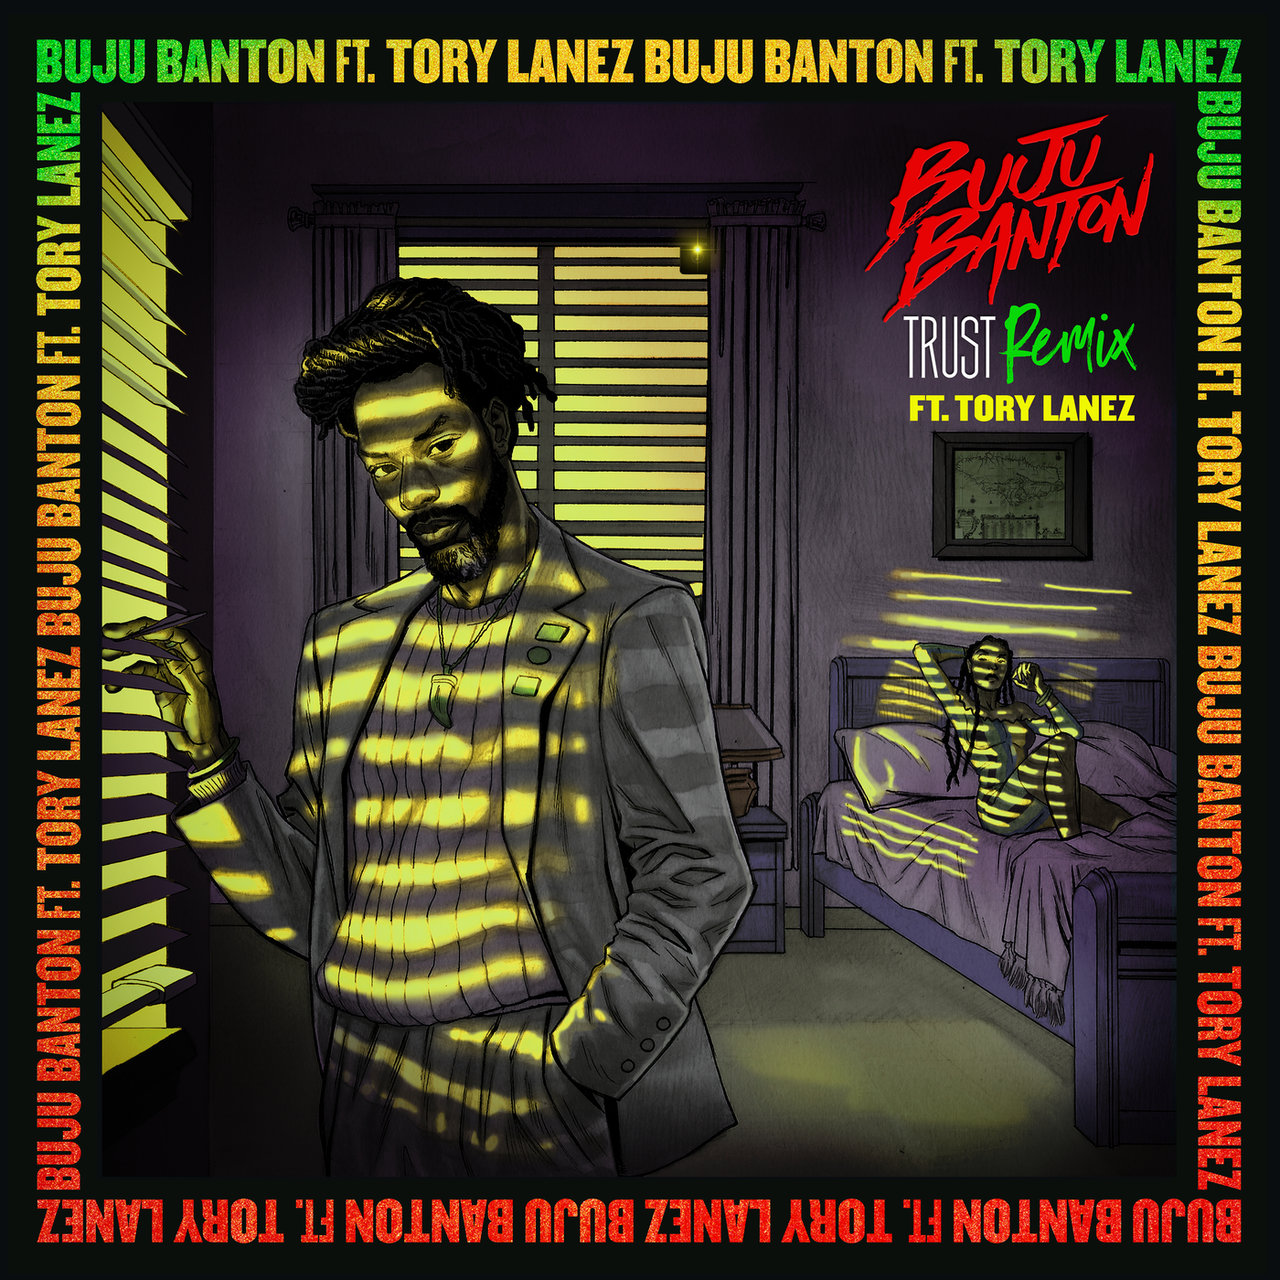 Buju Banton - Trust (Remix) (ft. Tory Lanez) (Cover)